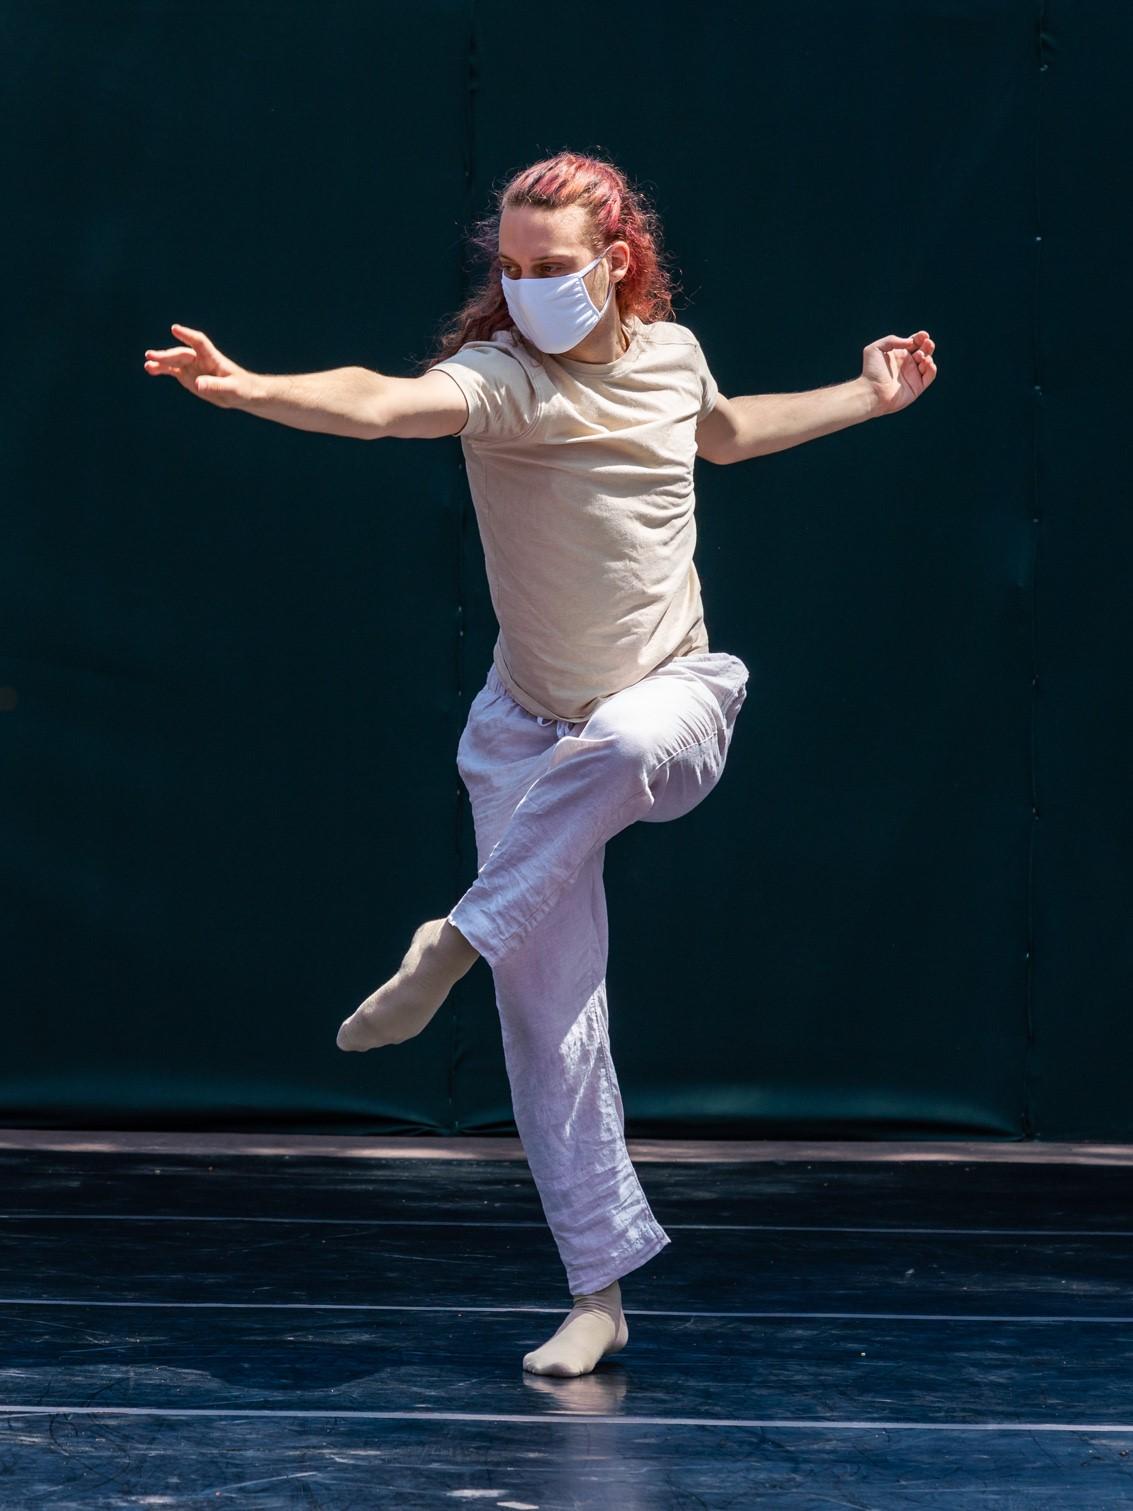 BFA Senior Drake Simon performing outdoors in a mask, leg in front attitude, arm extended forward